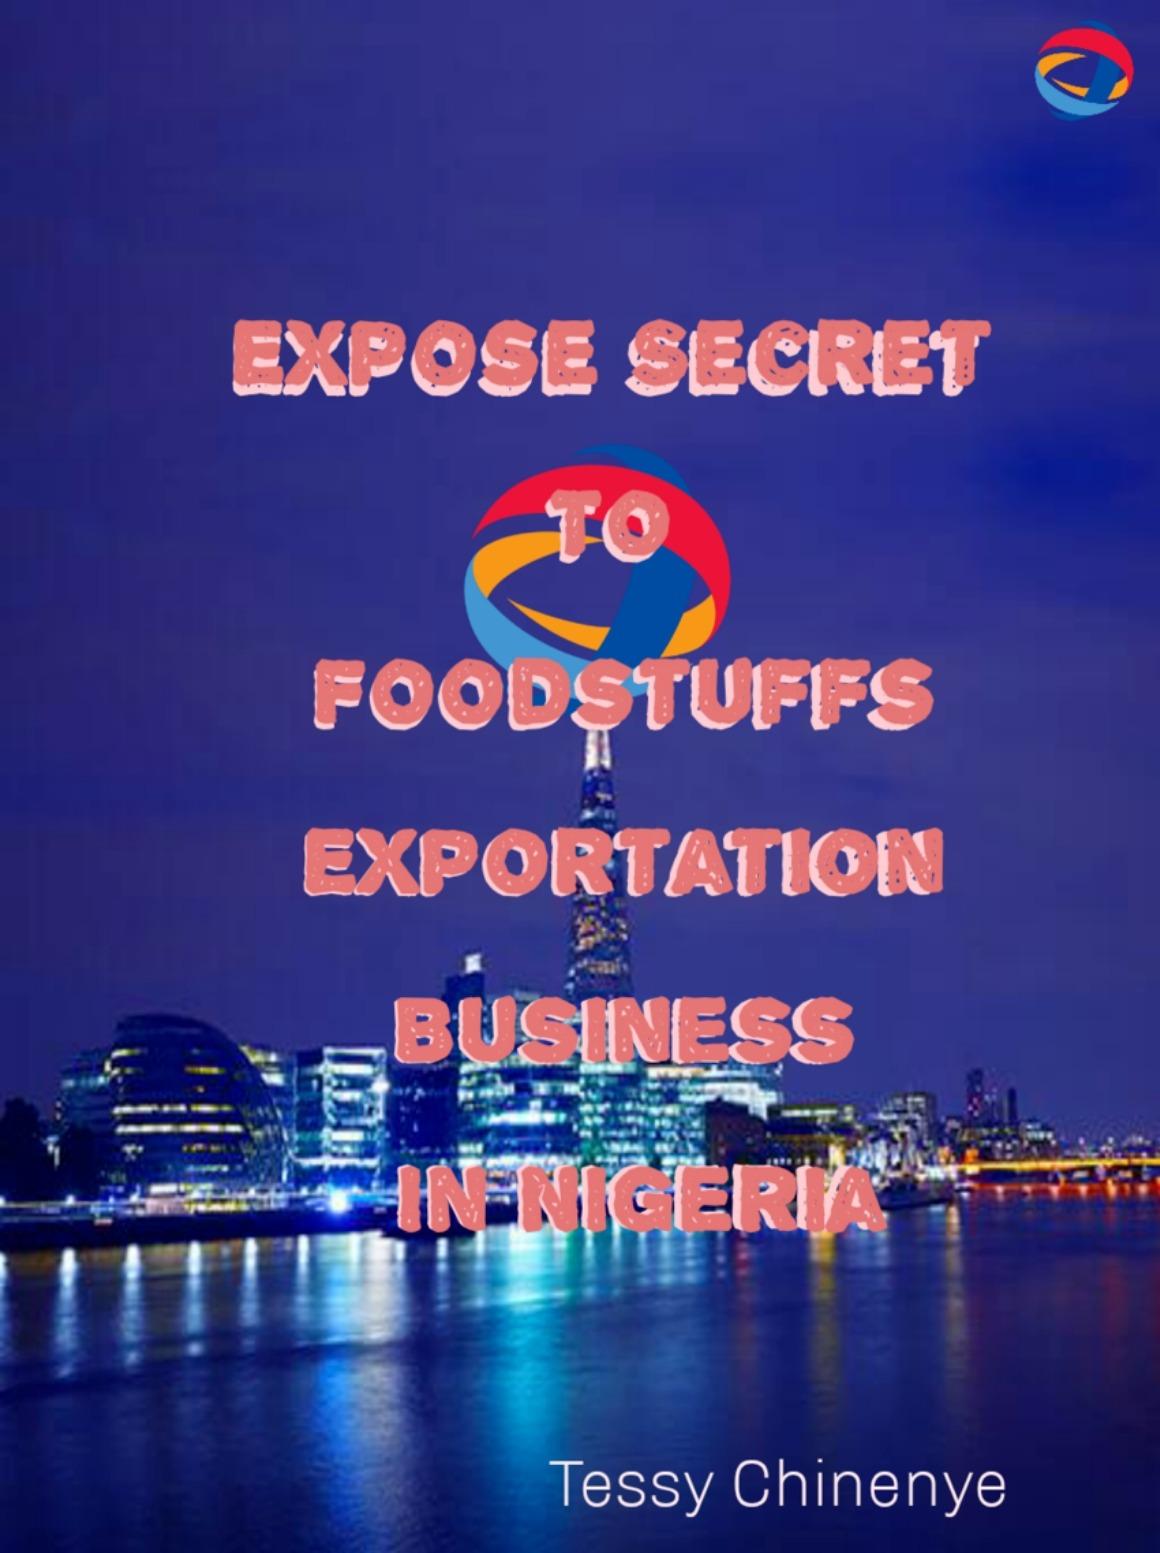 EXPOSE SECRET TO FOODSTUFF EXPORTATION BUSINESS IN NIGERIA